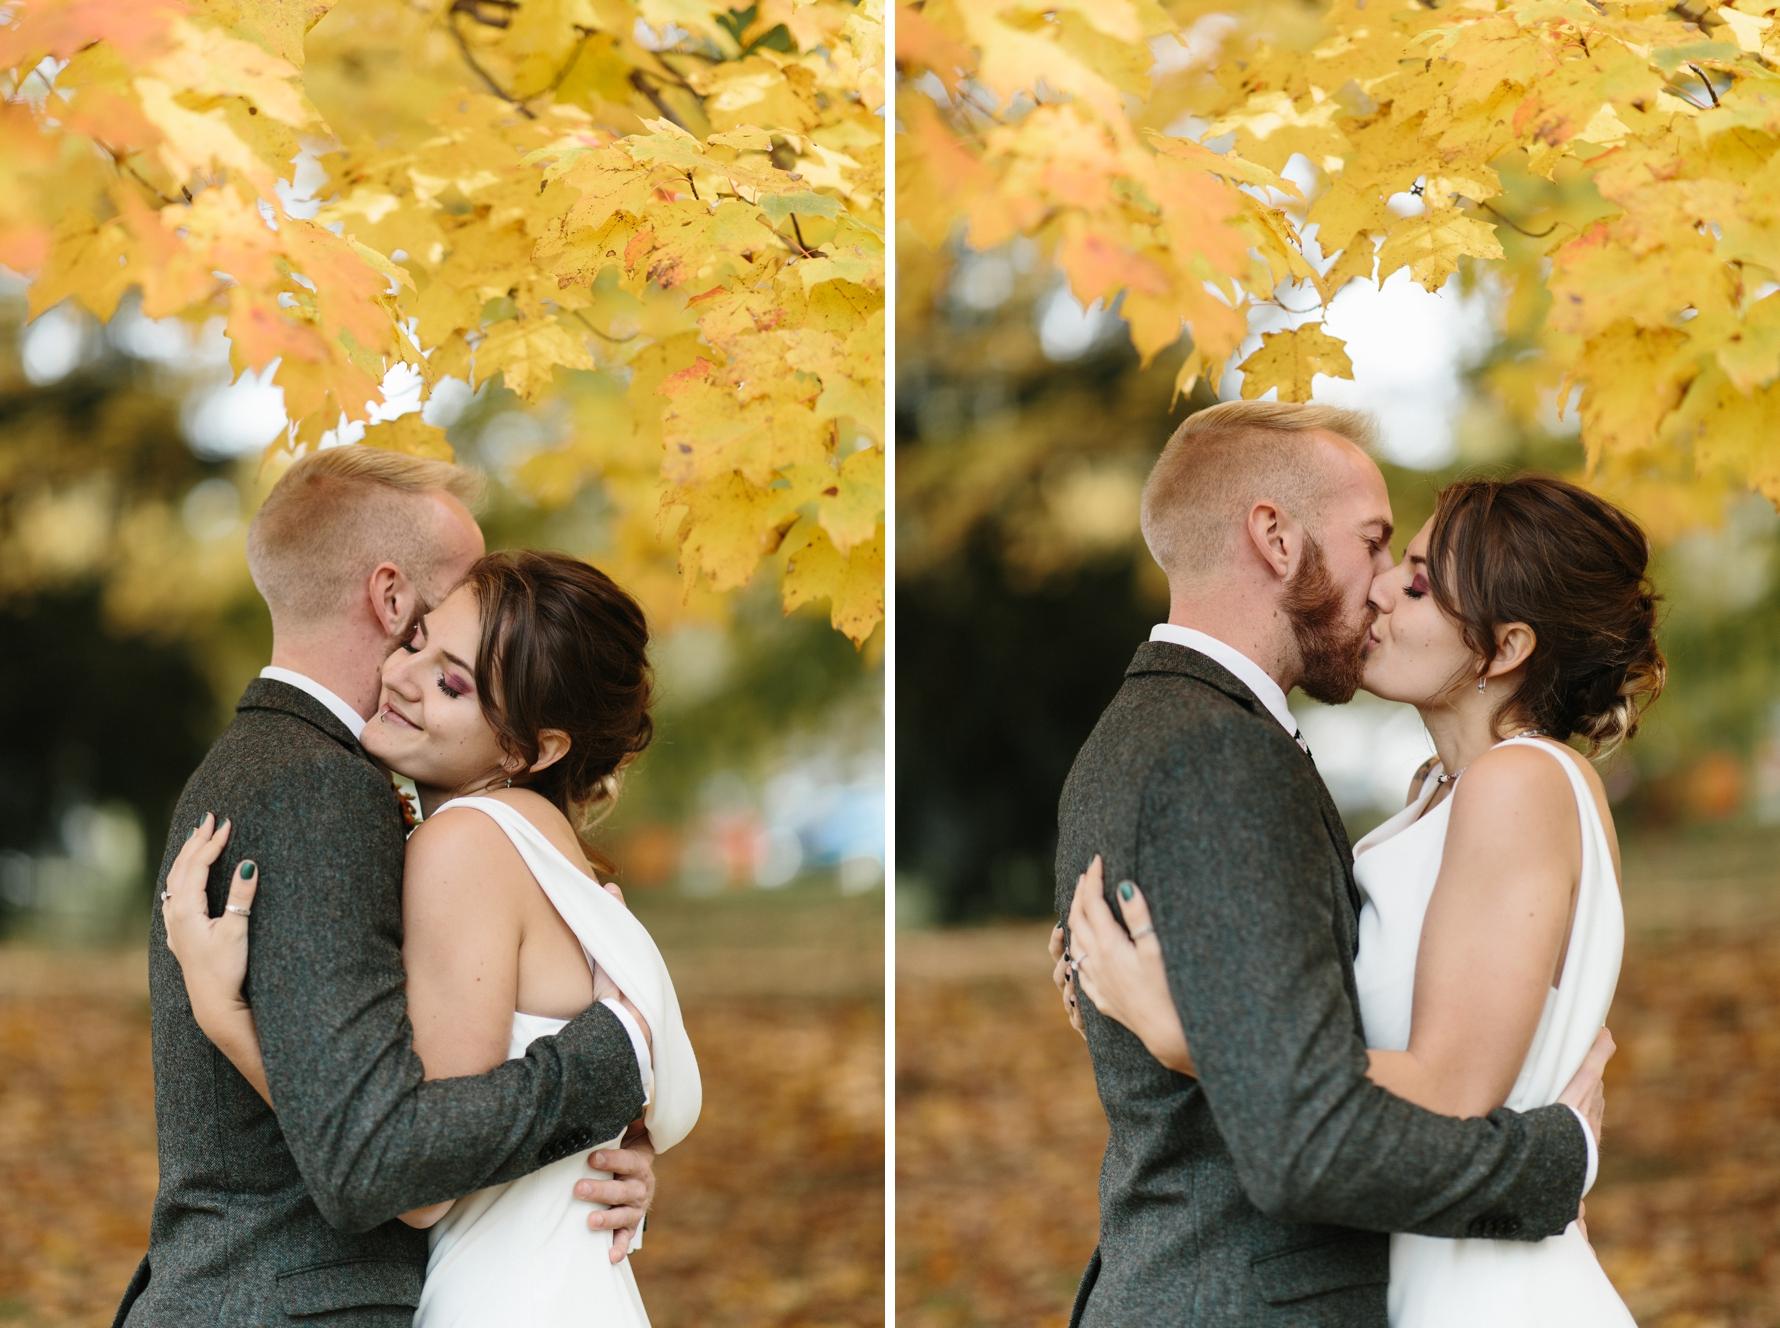 norris-traverse-city-wedding-30.JPG